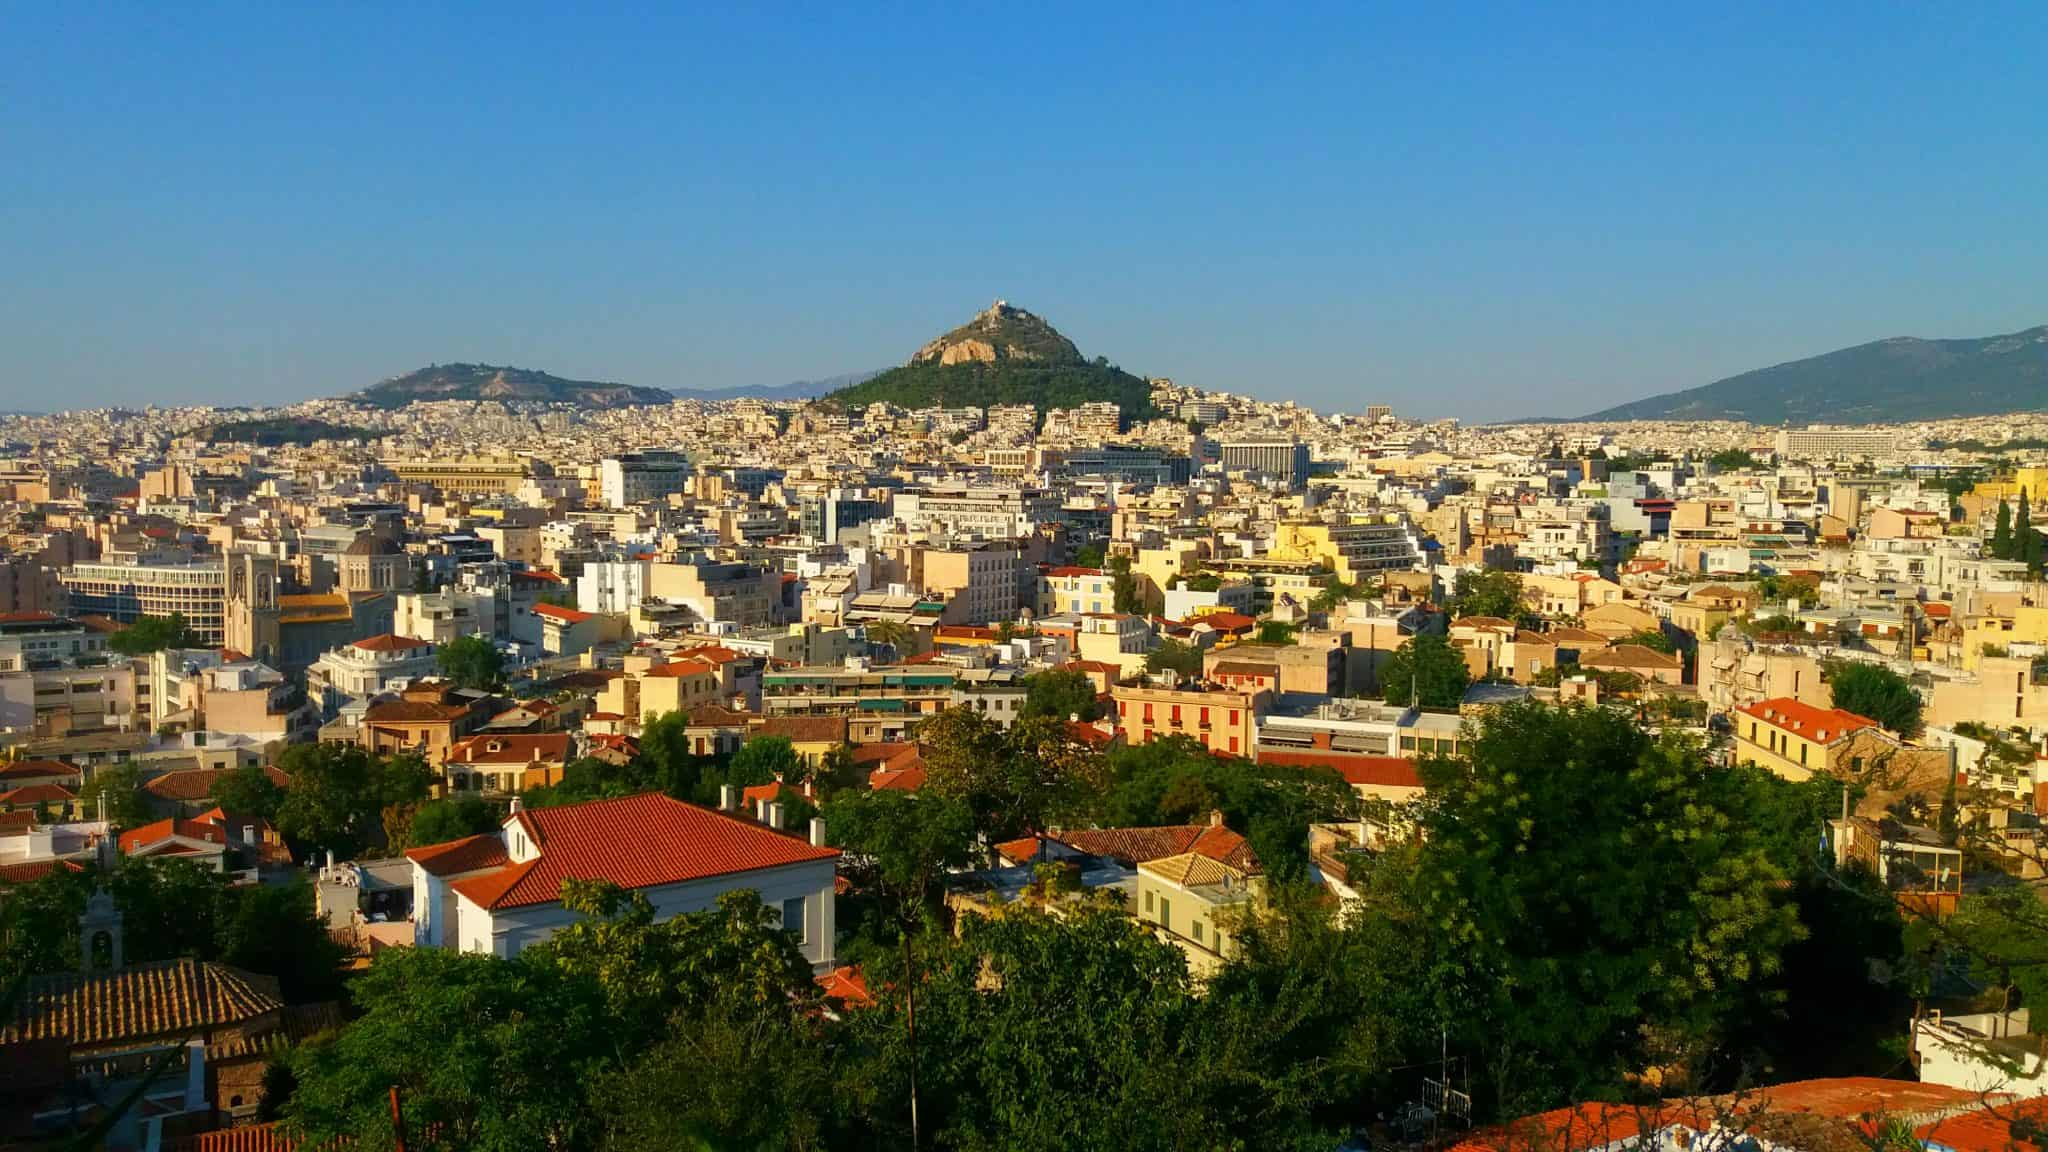 Blogi o Grecji